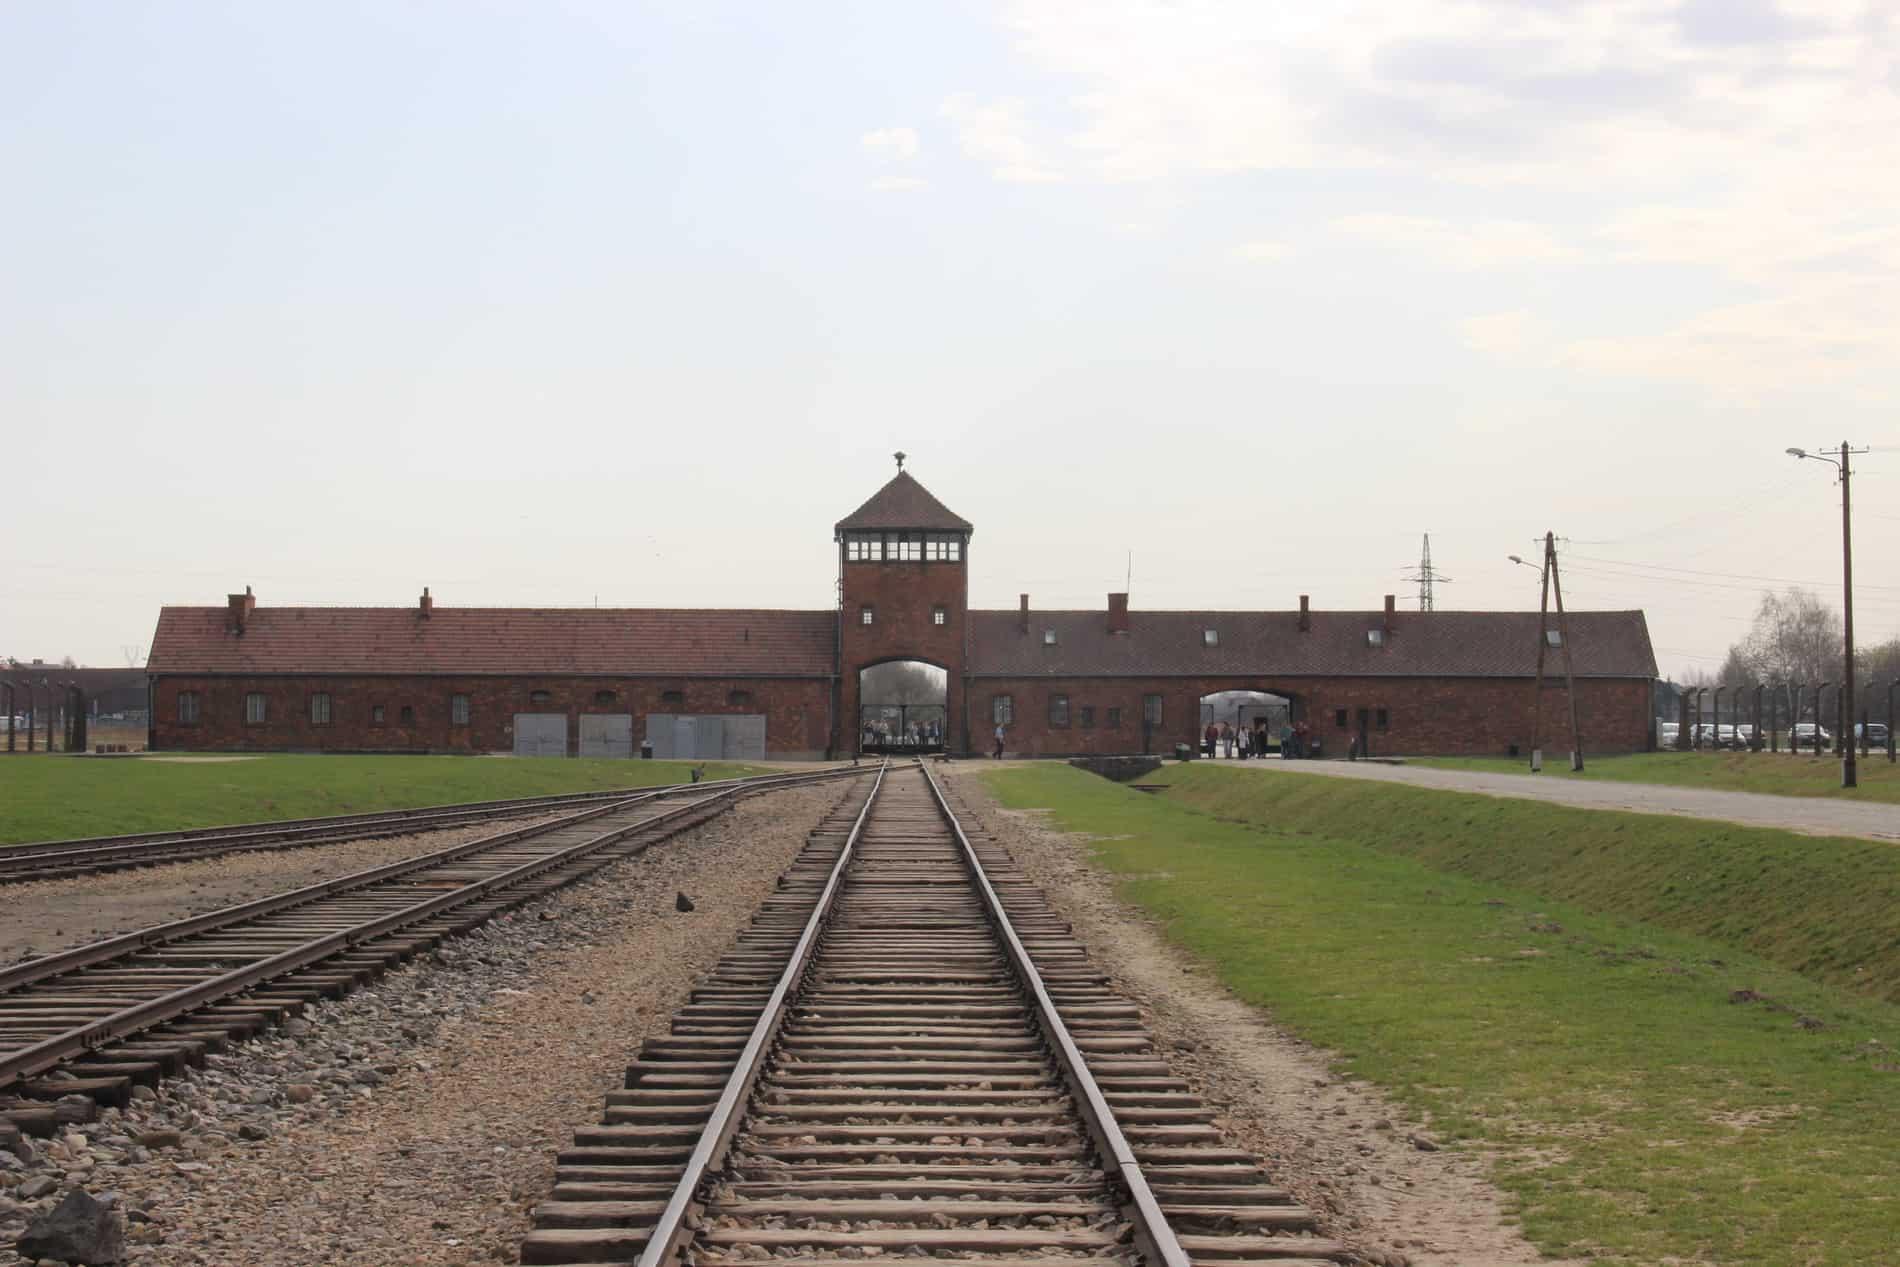 L'entrée du camp Auschwitz II Birkenau